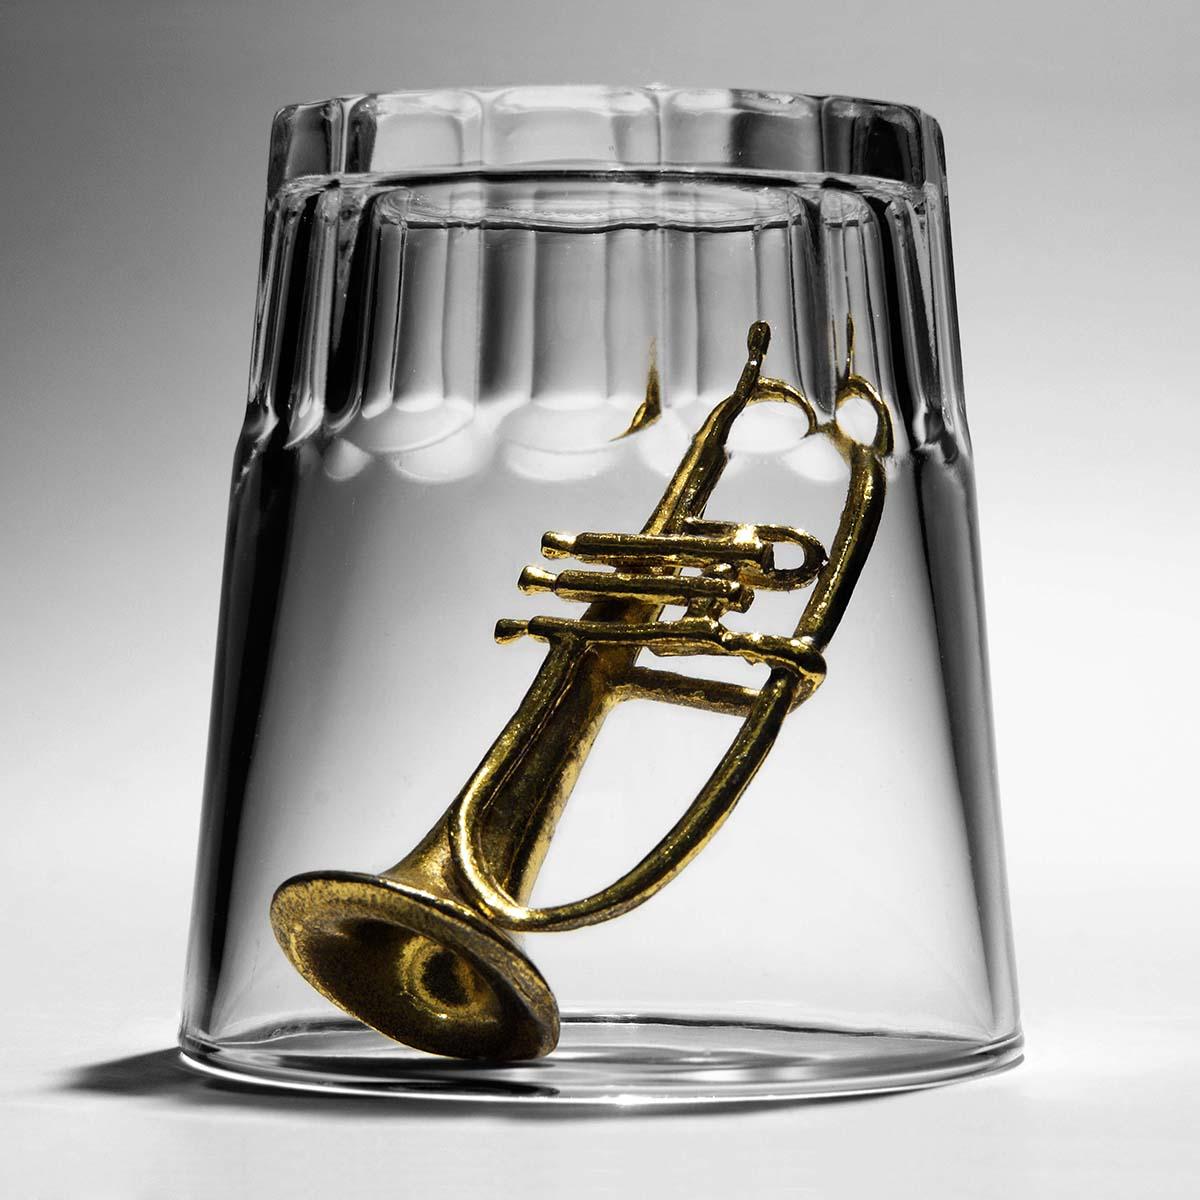 Luis Solana Lumbreras - Jazz